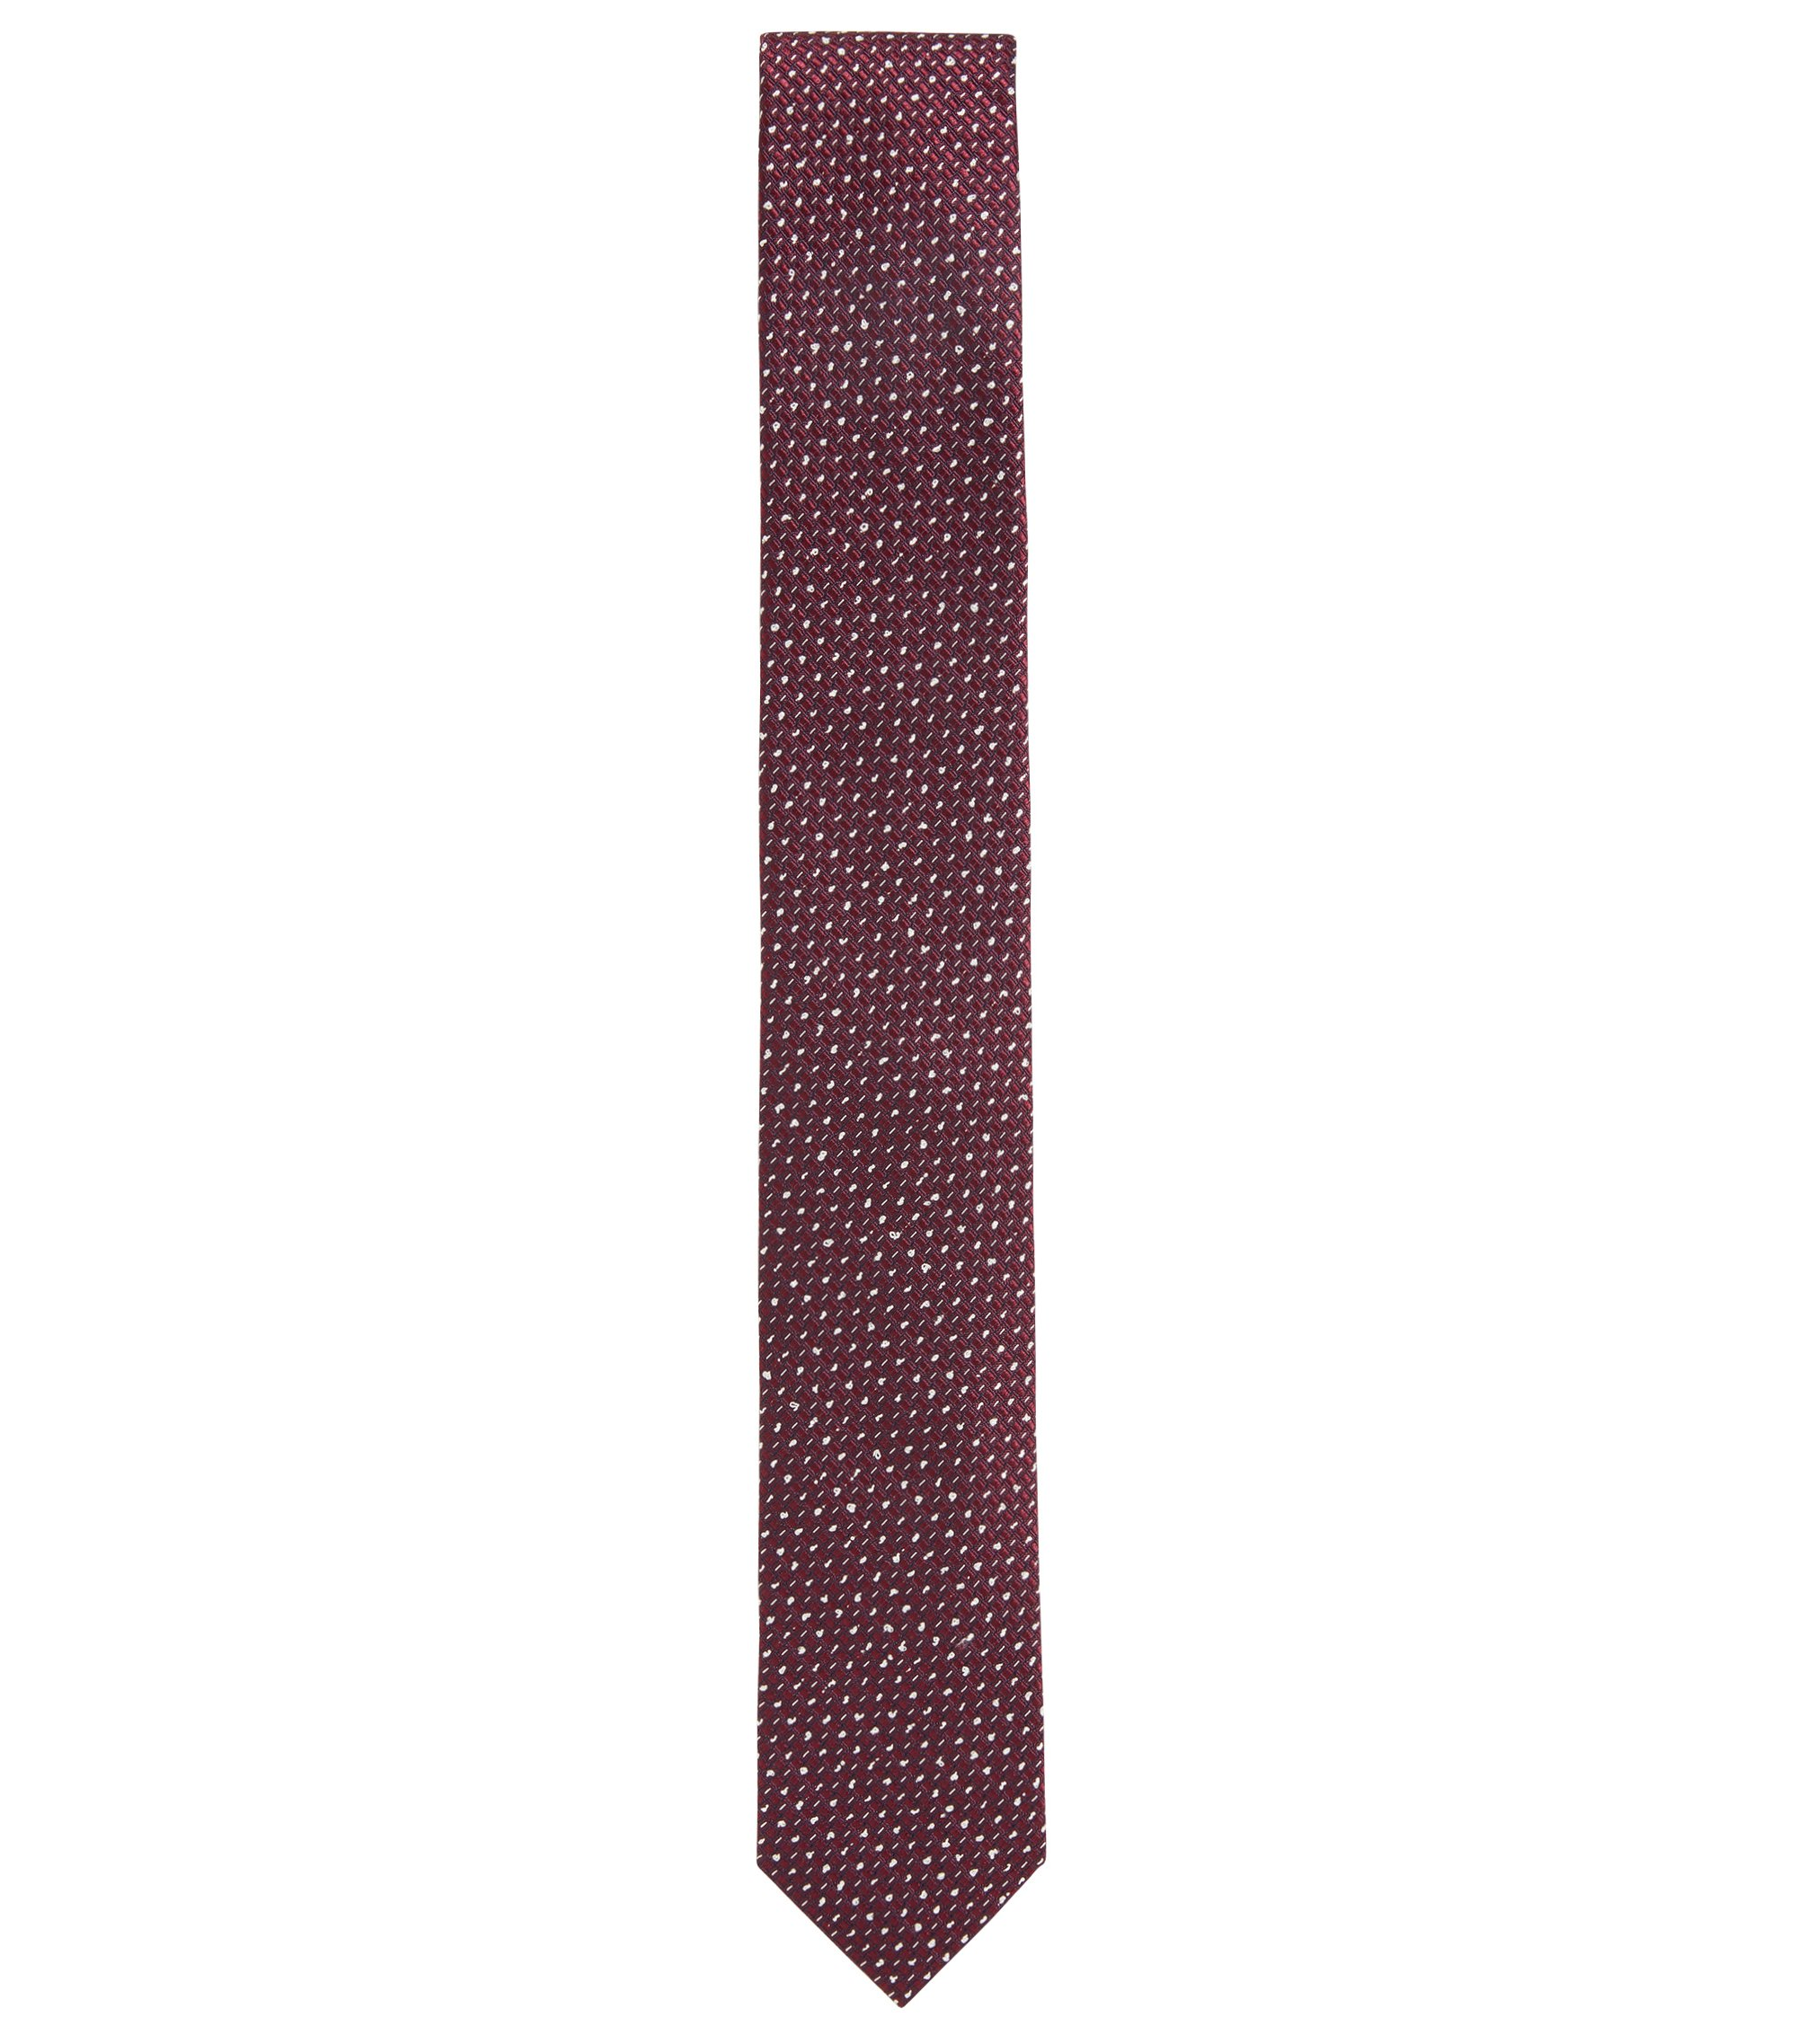 Microprint Embroidered Italian Silk Slim Tie, Dark pink